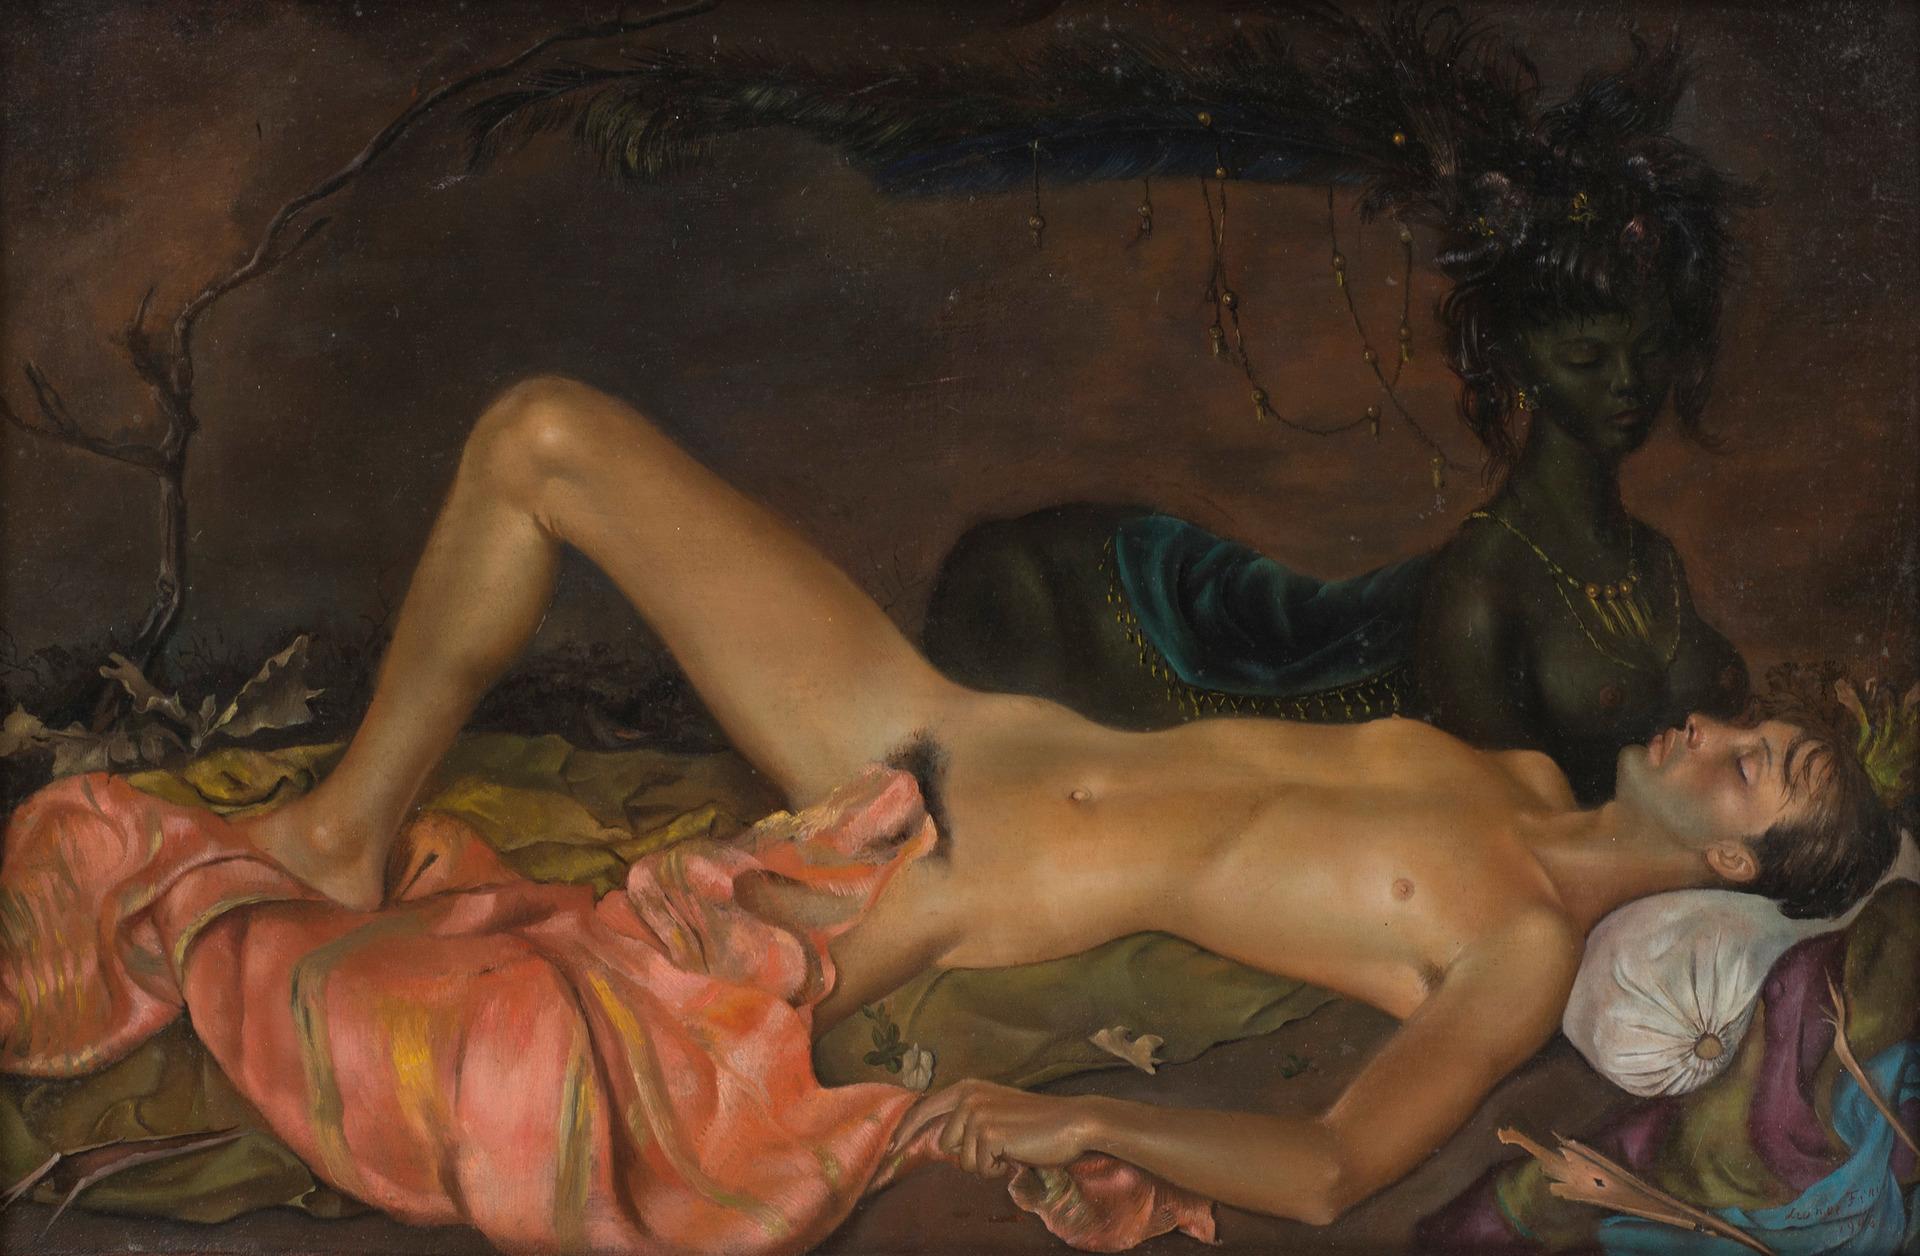 Schirn_Presse_Fantastische_Frauen_Leonor_Fini_Chtonian_Deity_watching_over_the_Sleep_of_a_Young_Man_1946.jpg